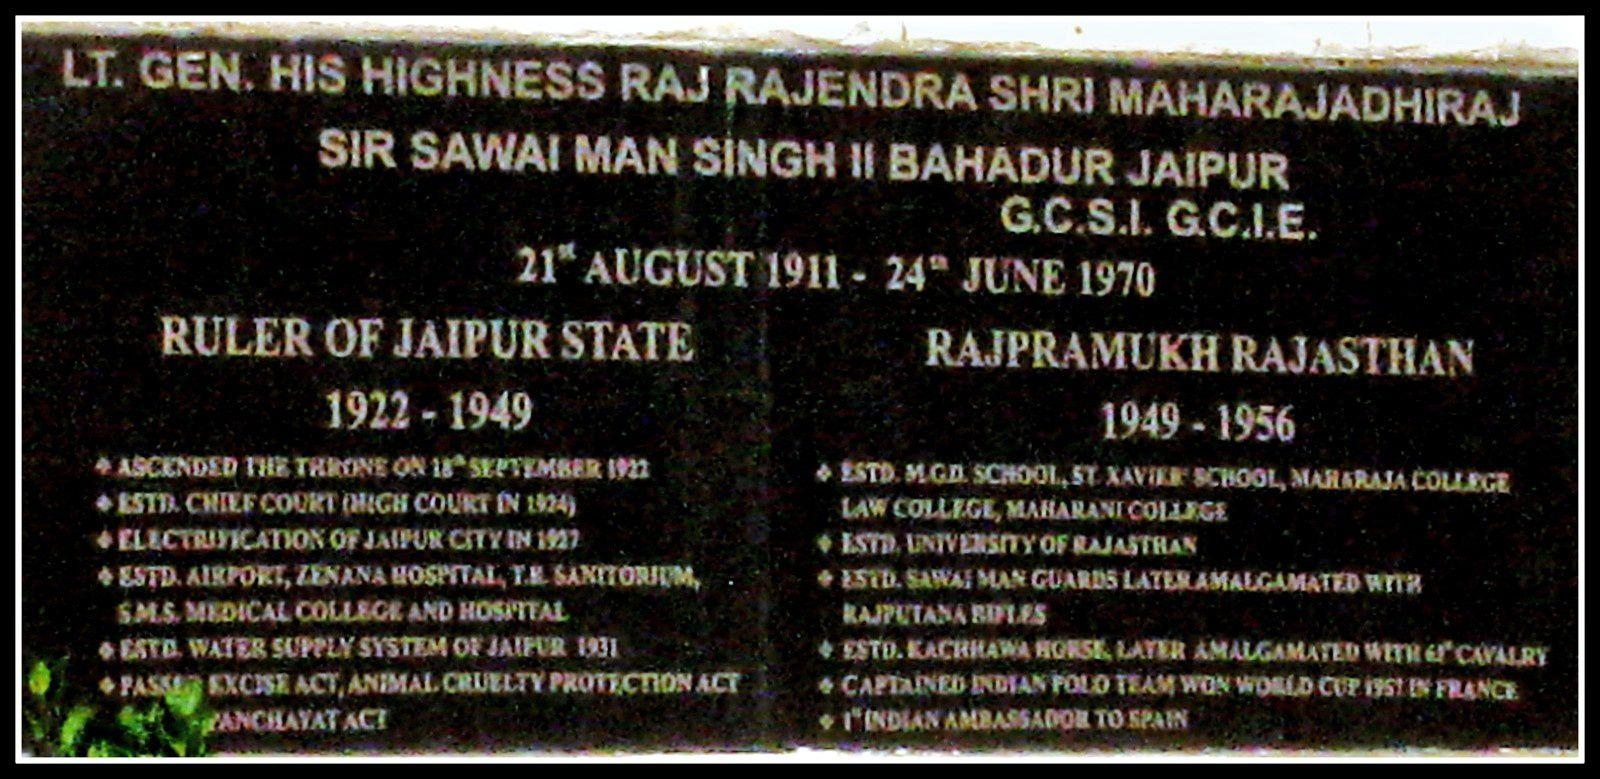 Man Singh II, statue équestre à Jaipur (Inde)